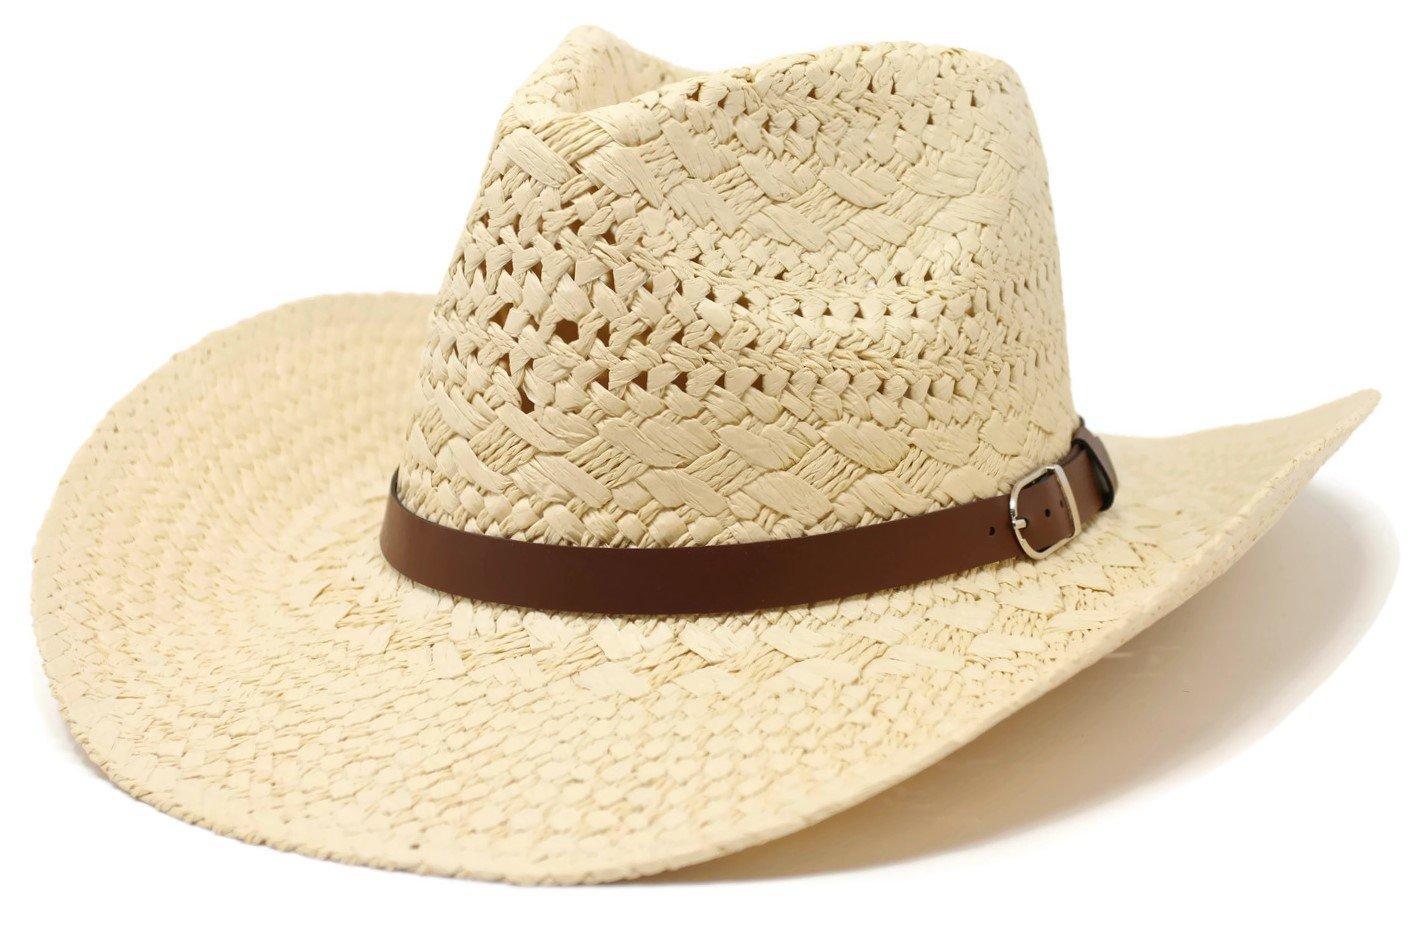 Cowboy Cowgirl Summer Sun Hat Western Rodeo Beach Cap (Beige)